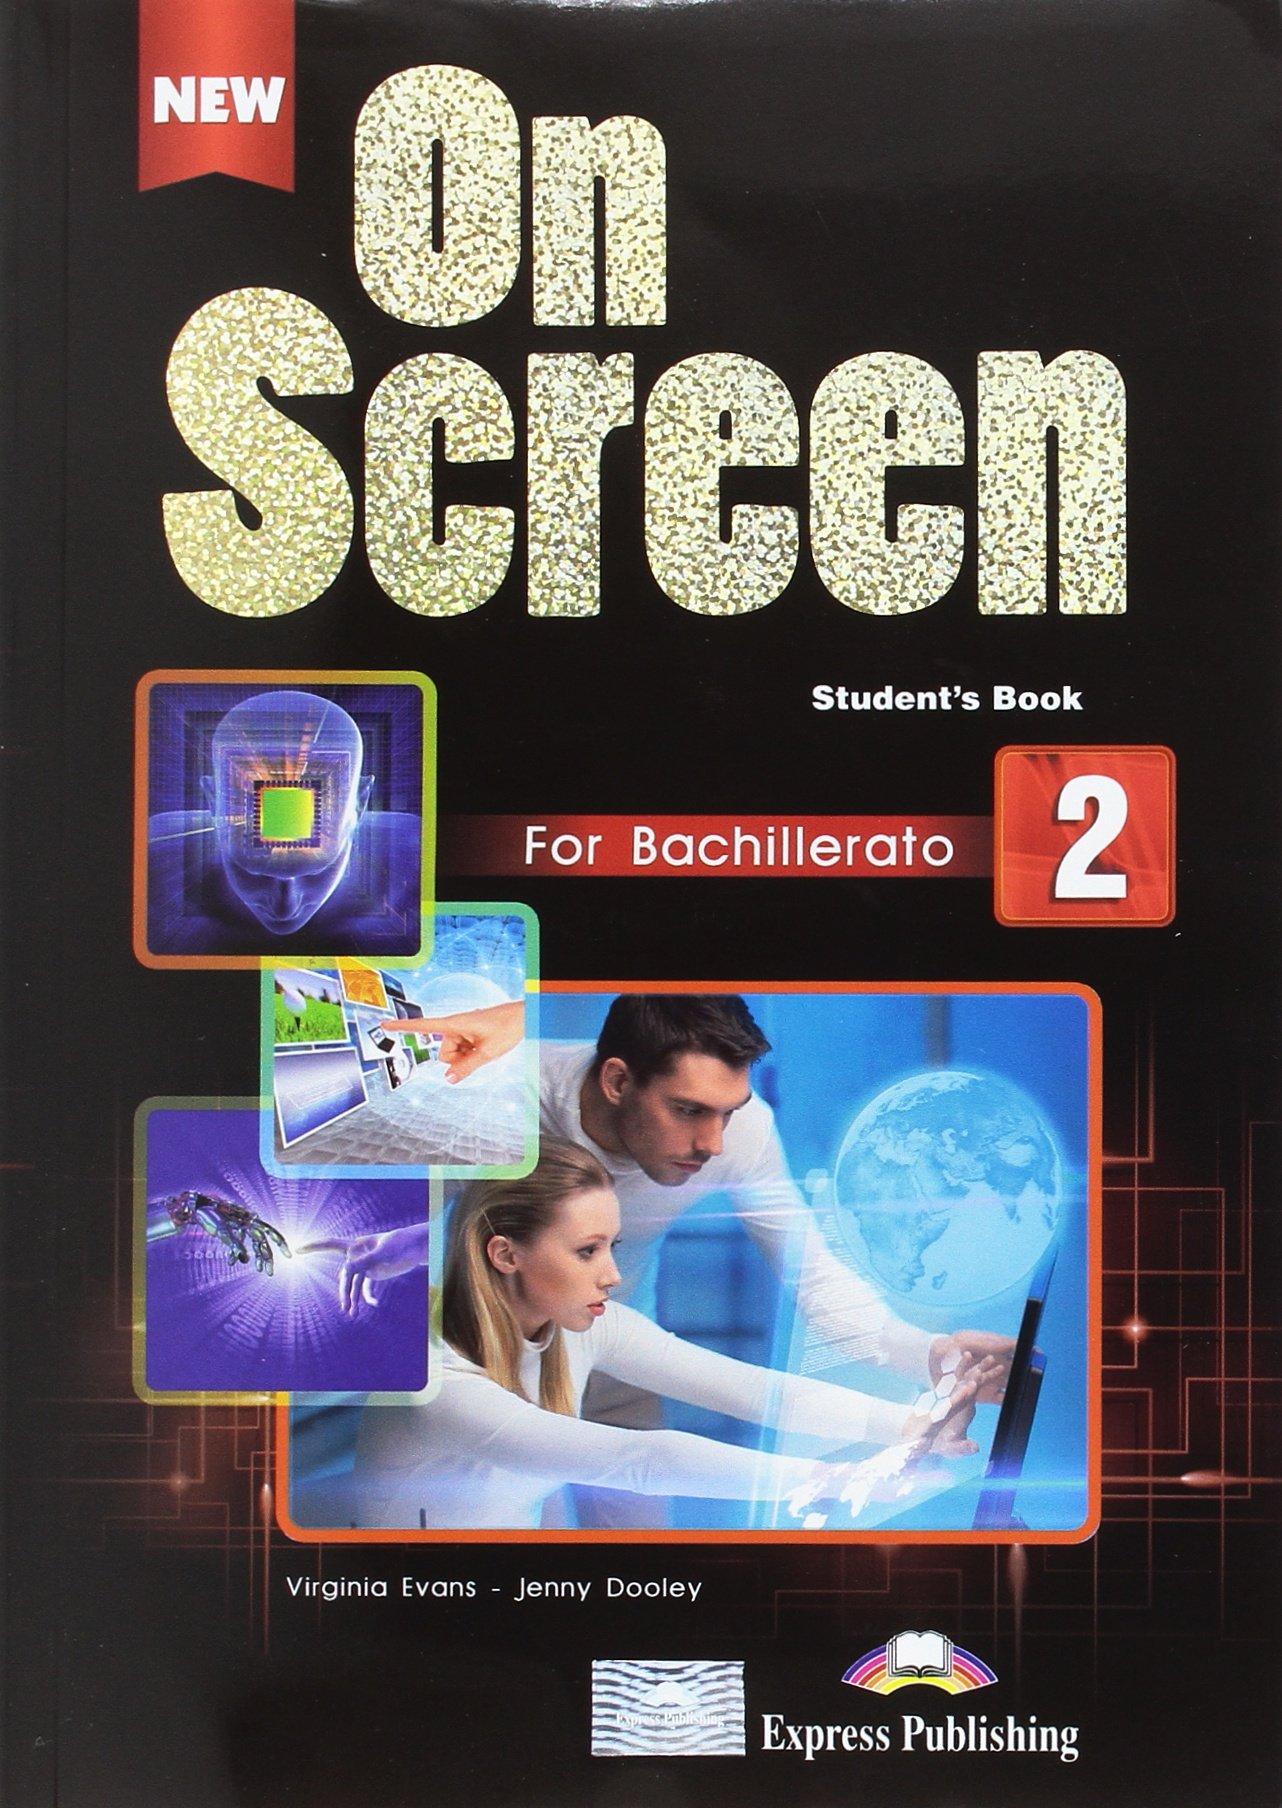 NEW ON SCREEN 2 STUDENTS PACK: Amazon.es: Express Publishing (obra colectiva): Libros en idiomas extranjeros